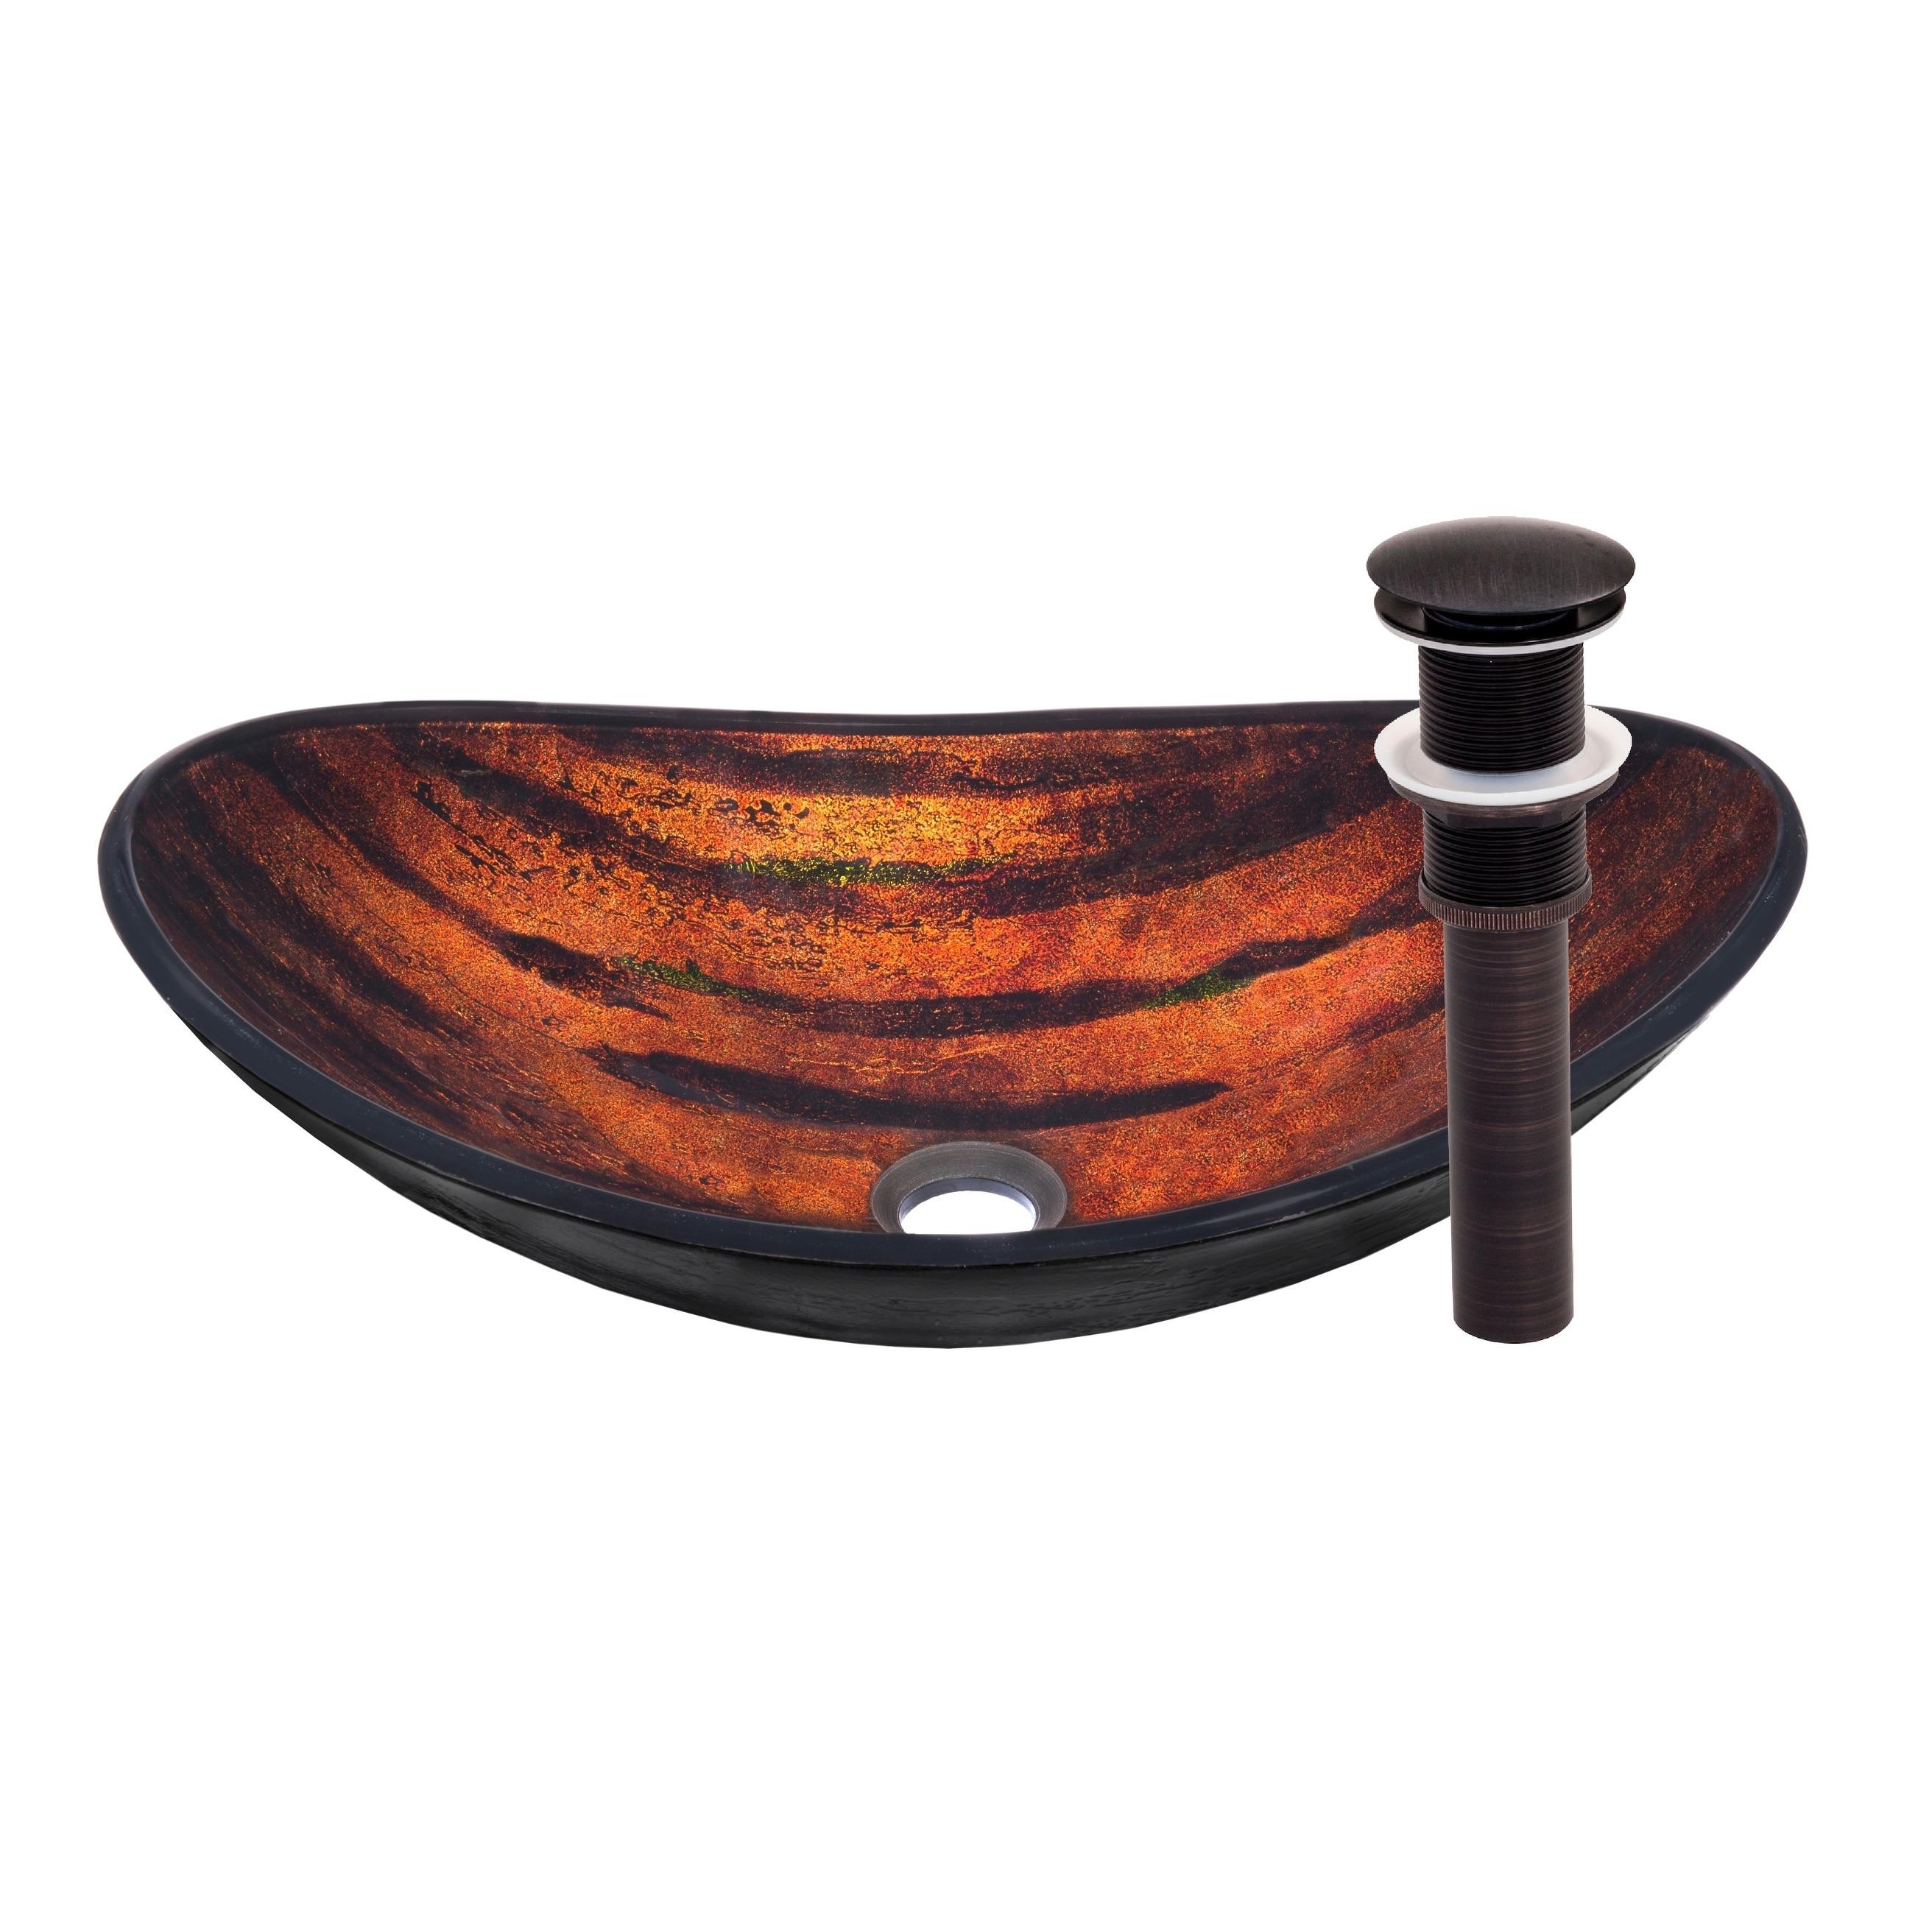 Magnificent Oil Rubbed Bronze Bath Caddy Ensign - Luxurious Bathtub ...